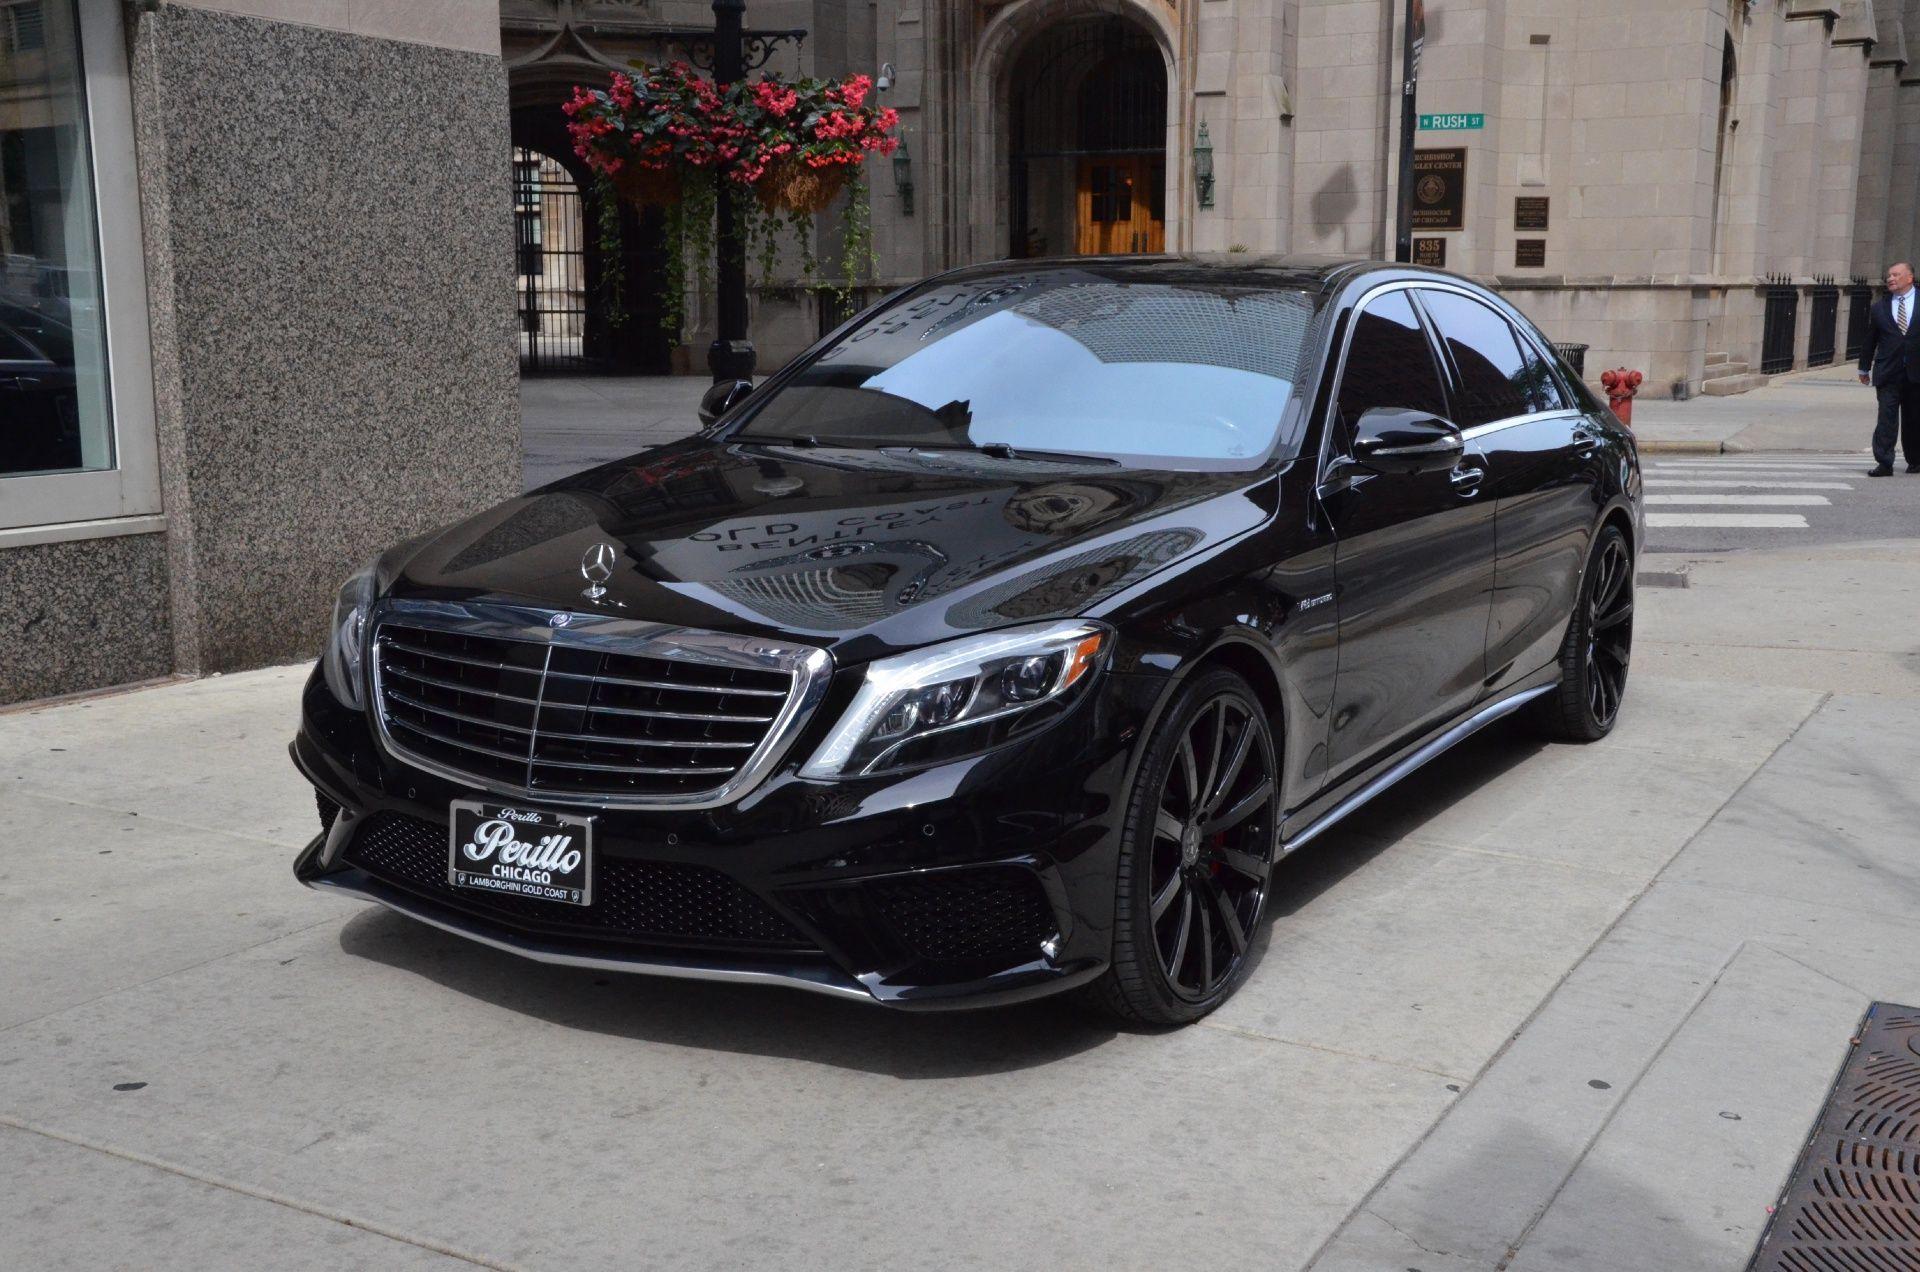 2014 mercedes benz s class - Mercedes Benz 2014 S Class Black